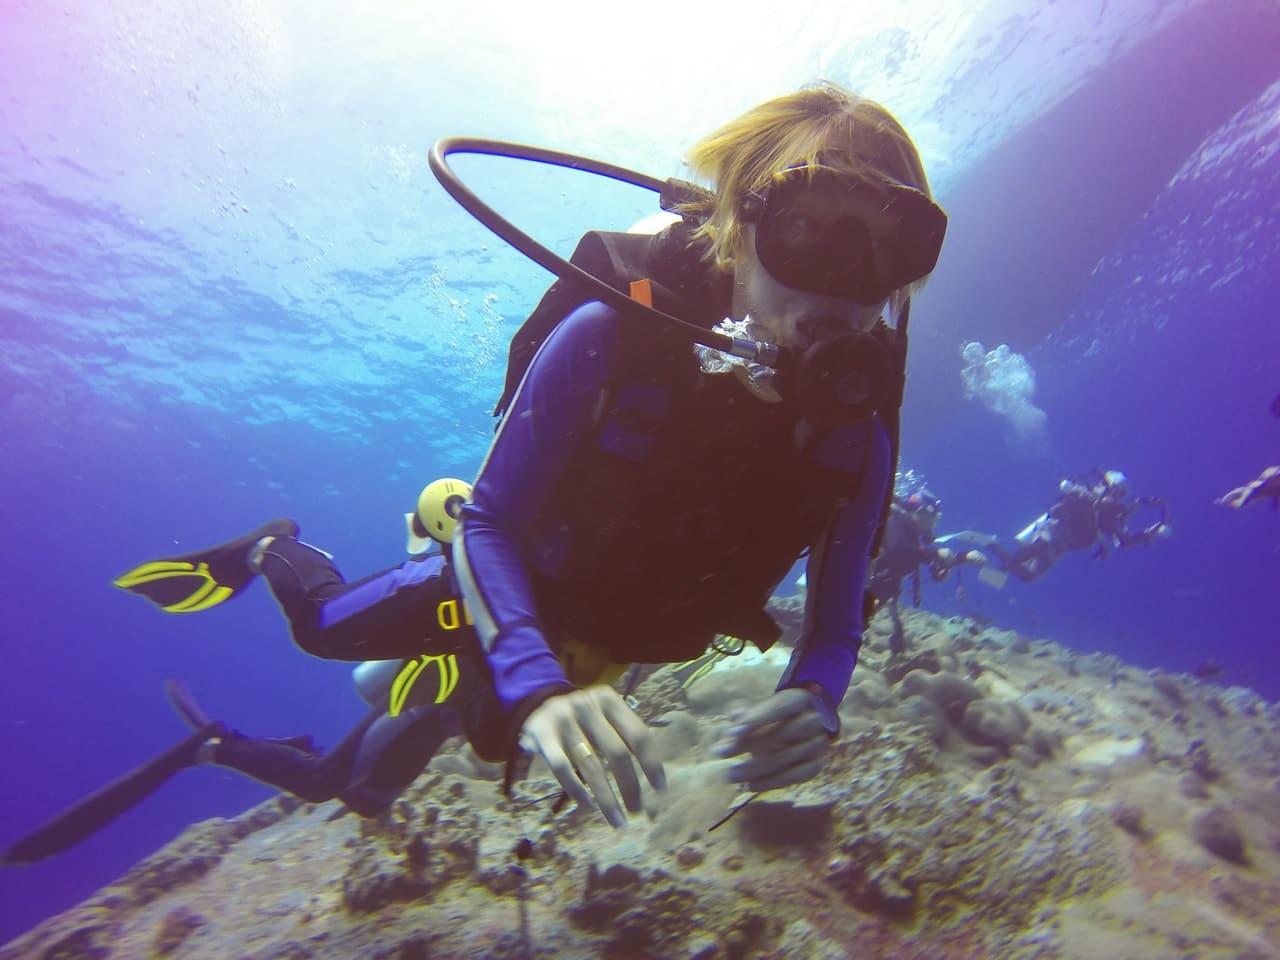 Dykker dykker rundt under vandet